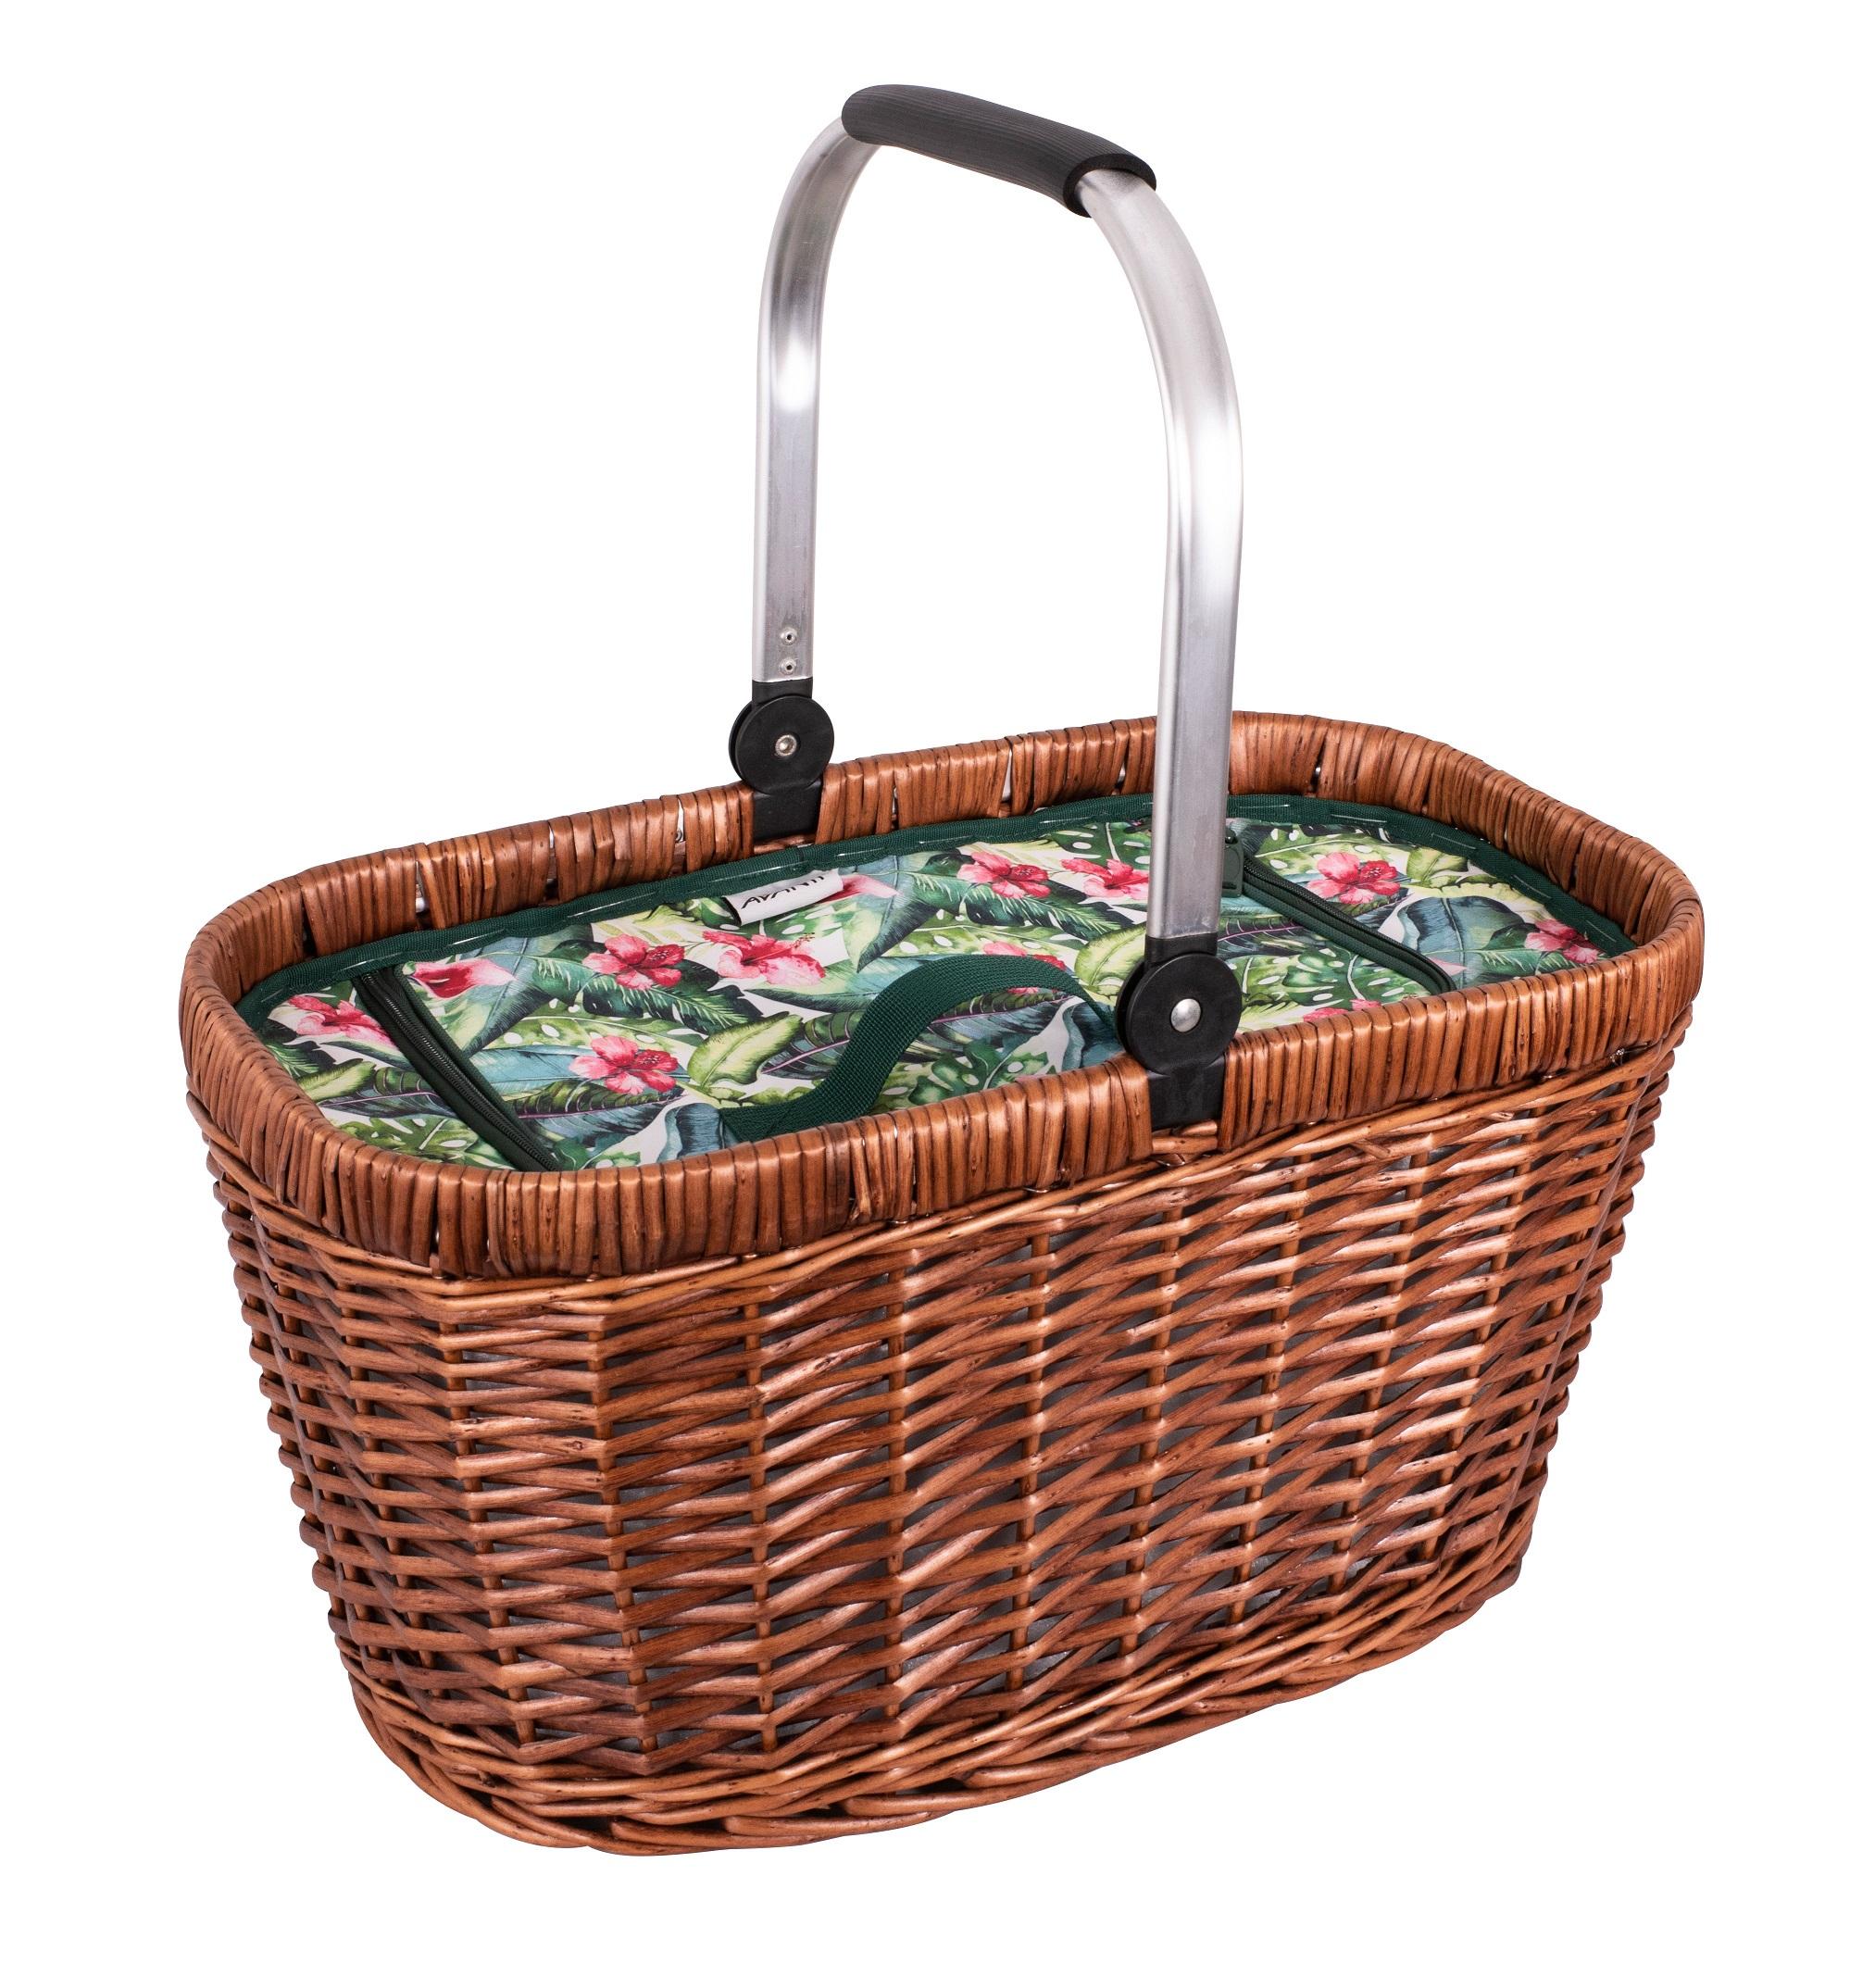 hibiscus patterened picnic basket